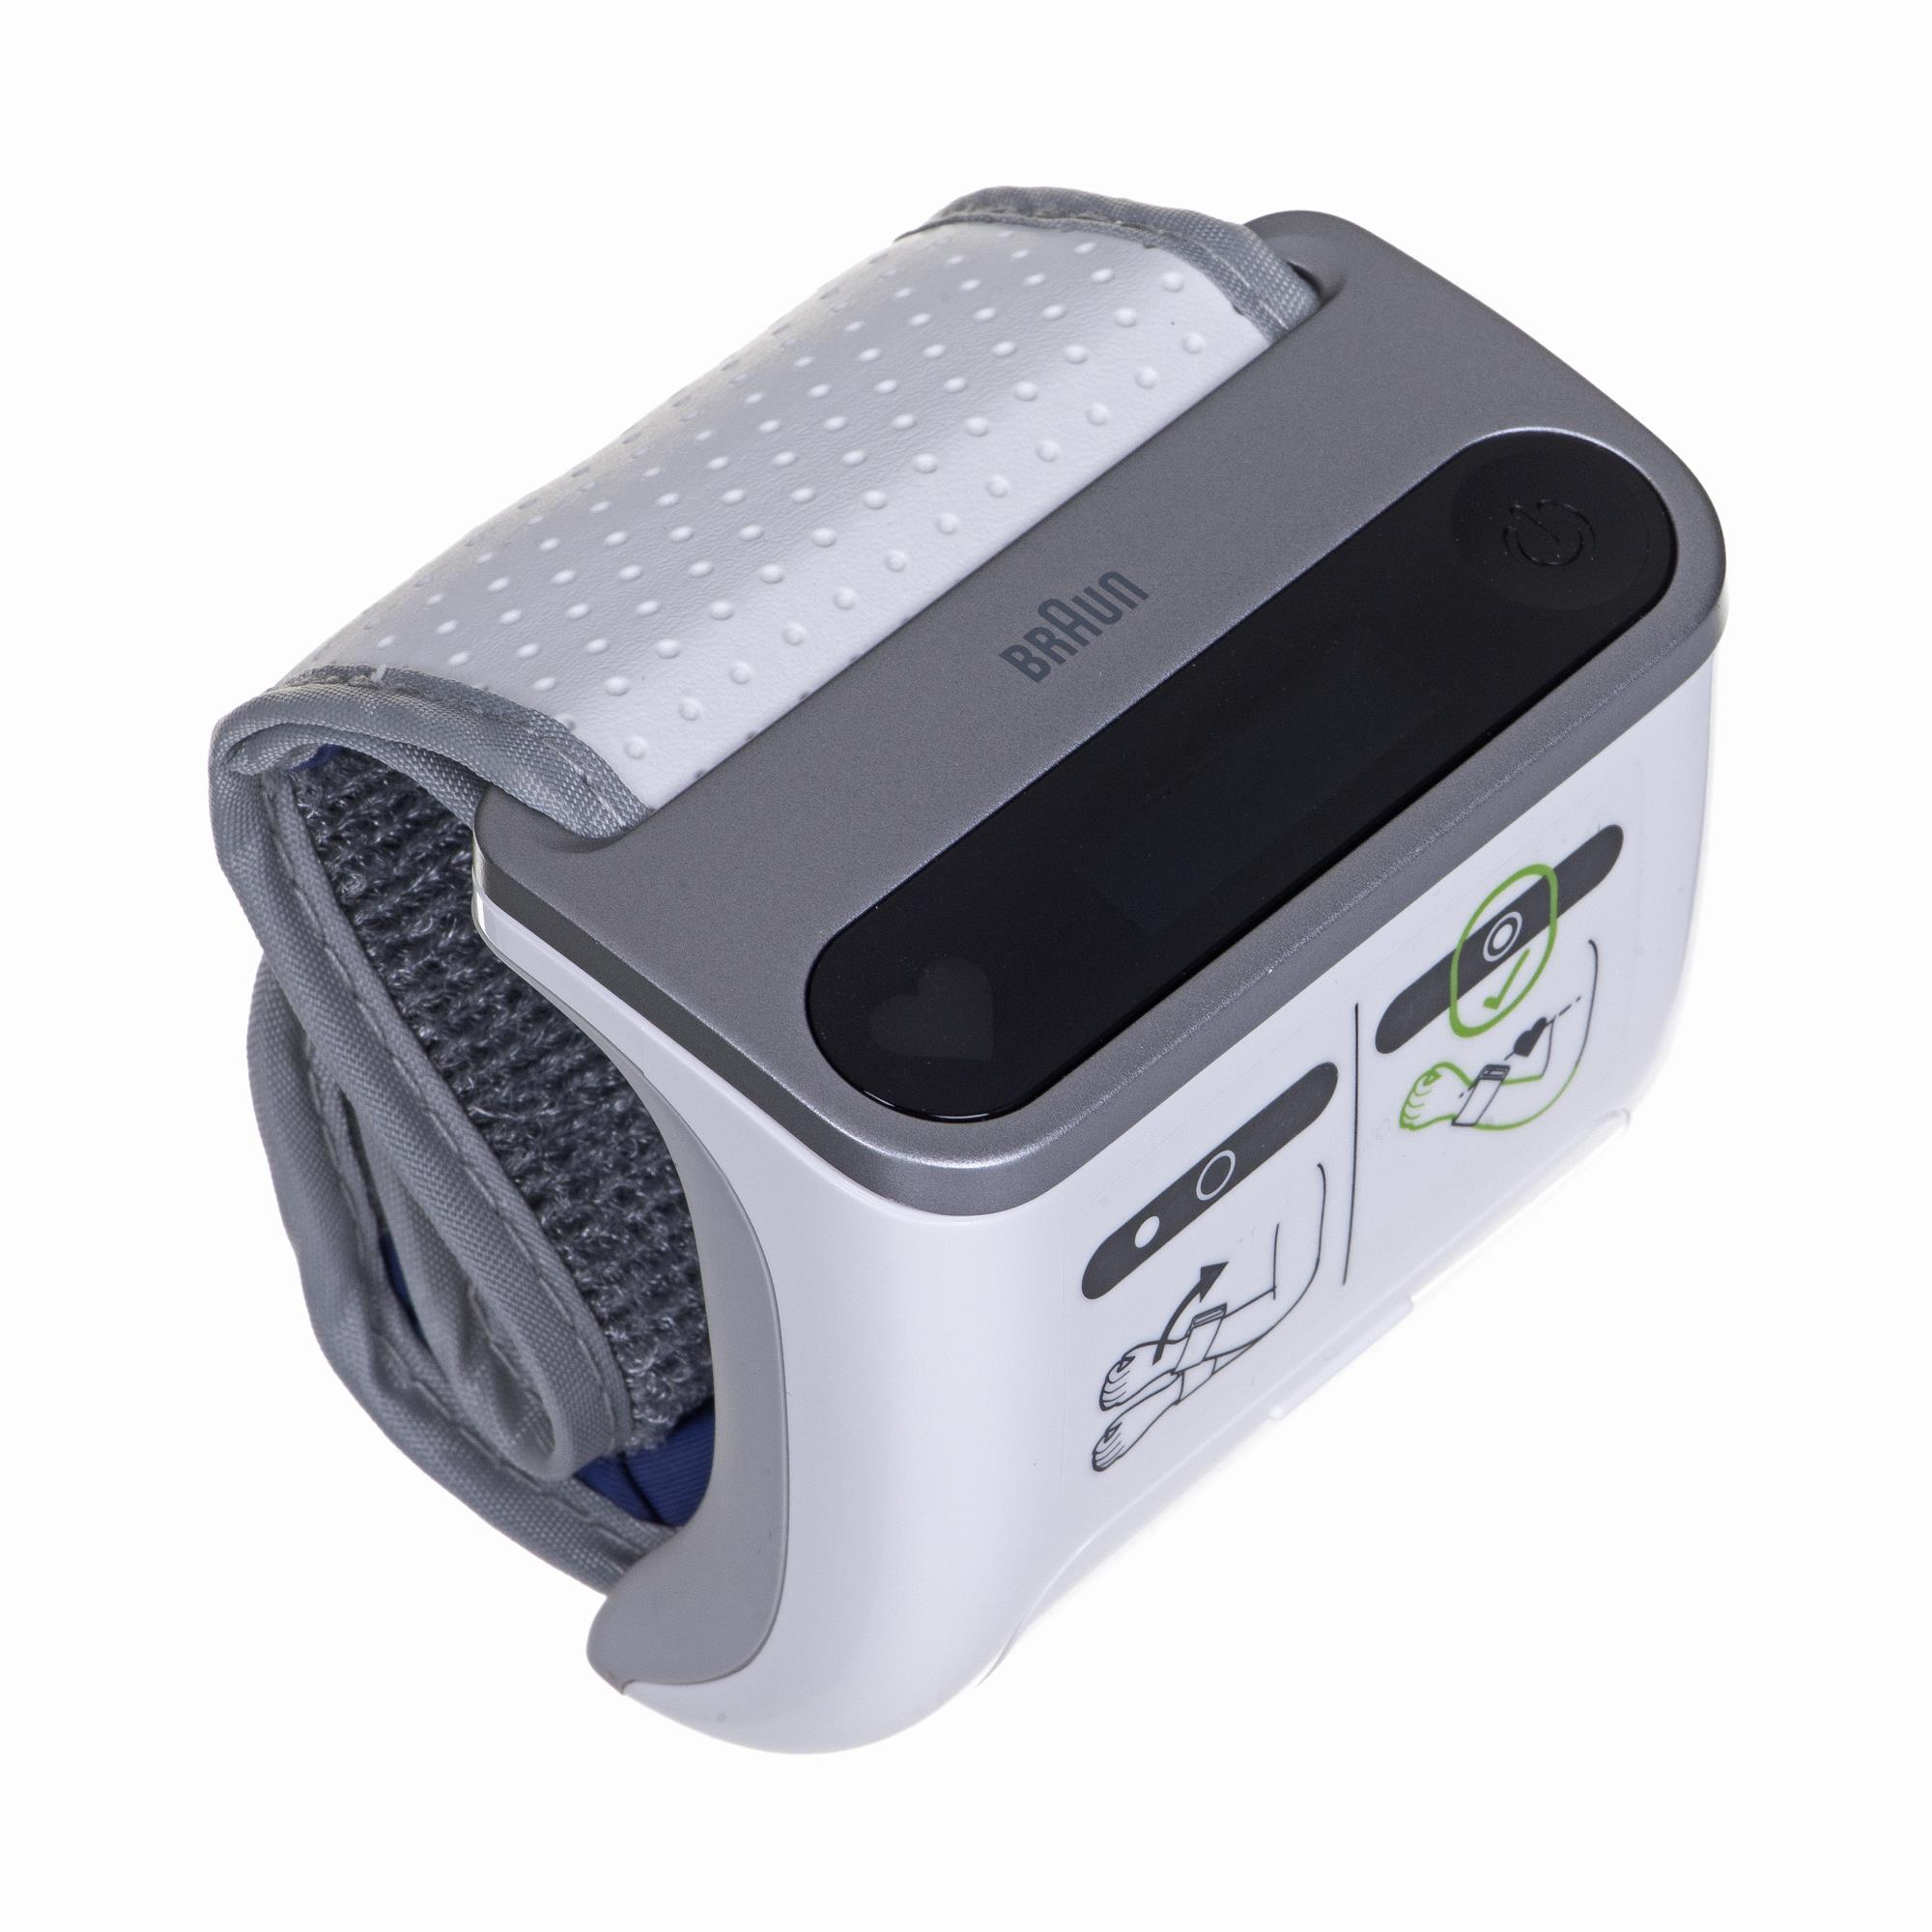 Braun Blood Pressure Monitor BPW4500 iCheck 7 Memory capacity 100 readings, Display OLED 4022167145000